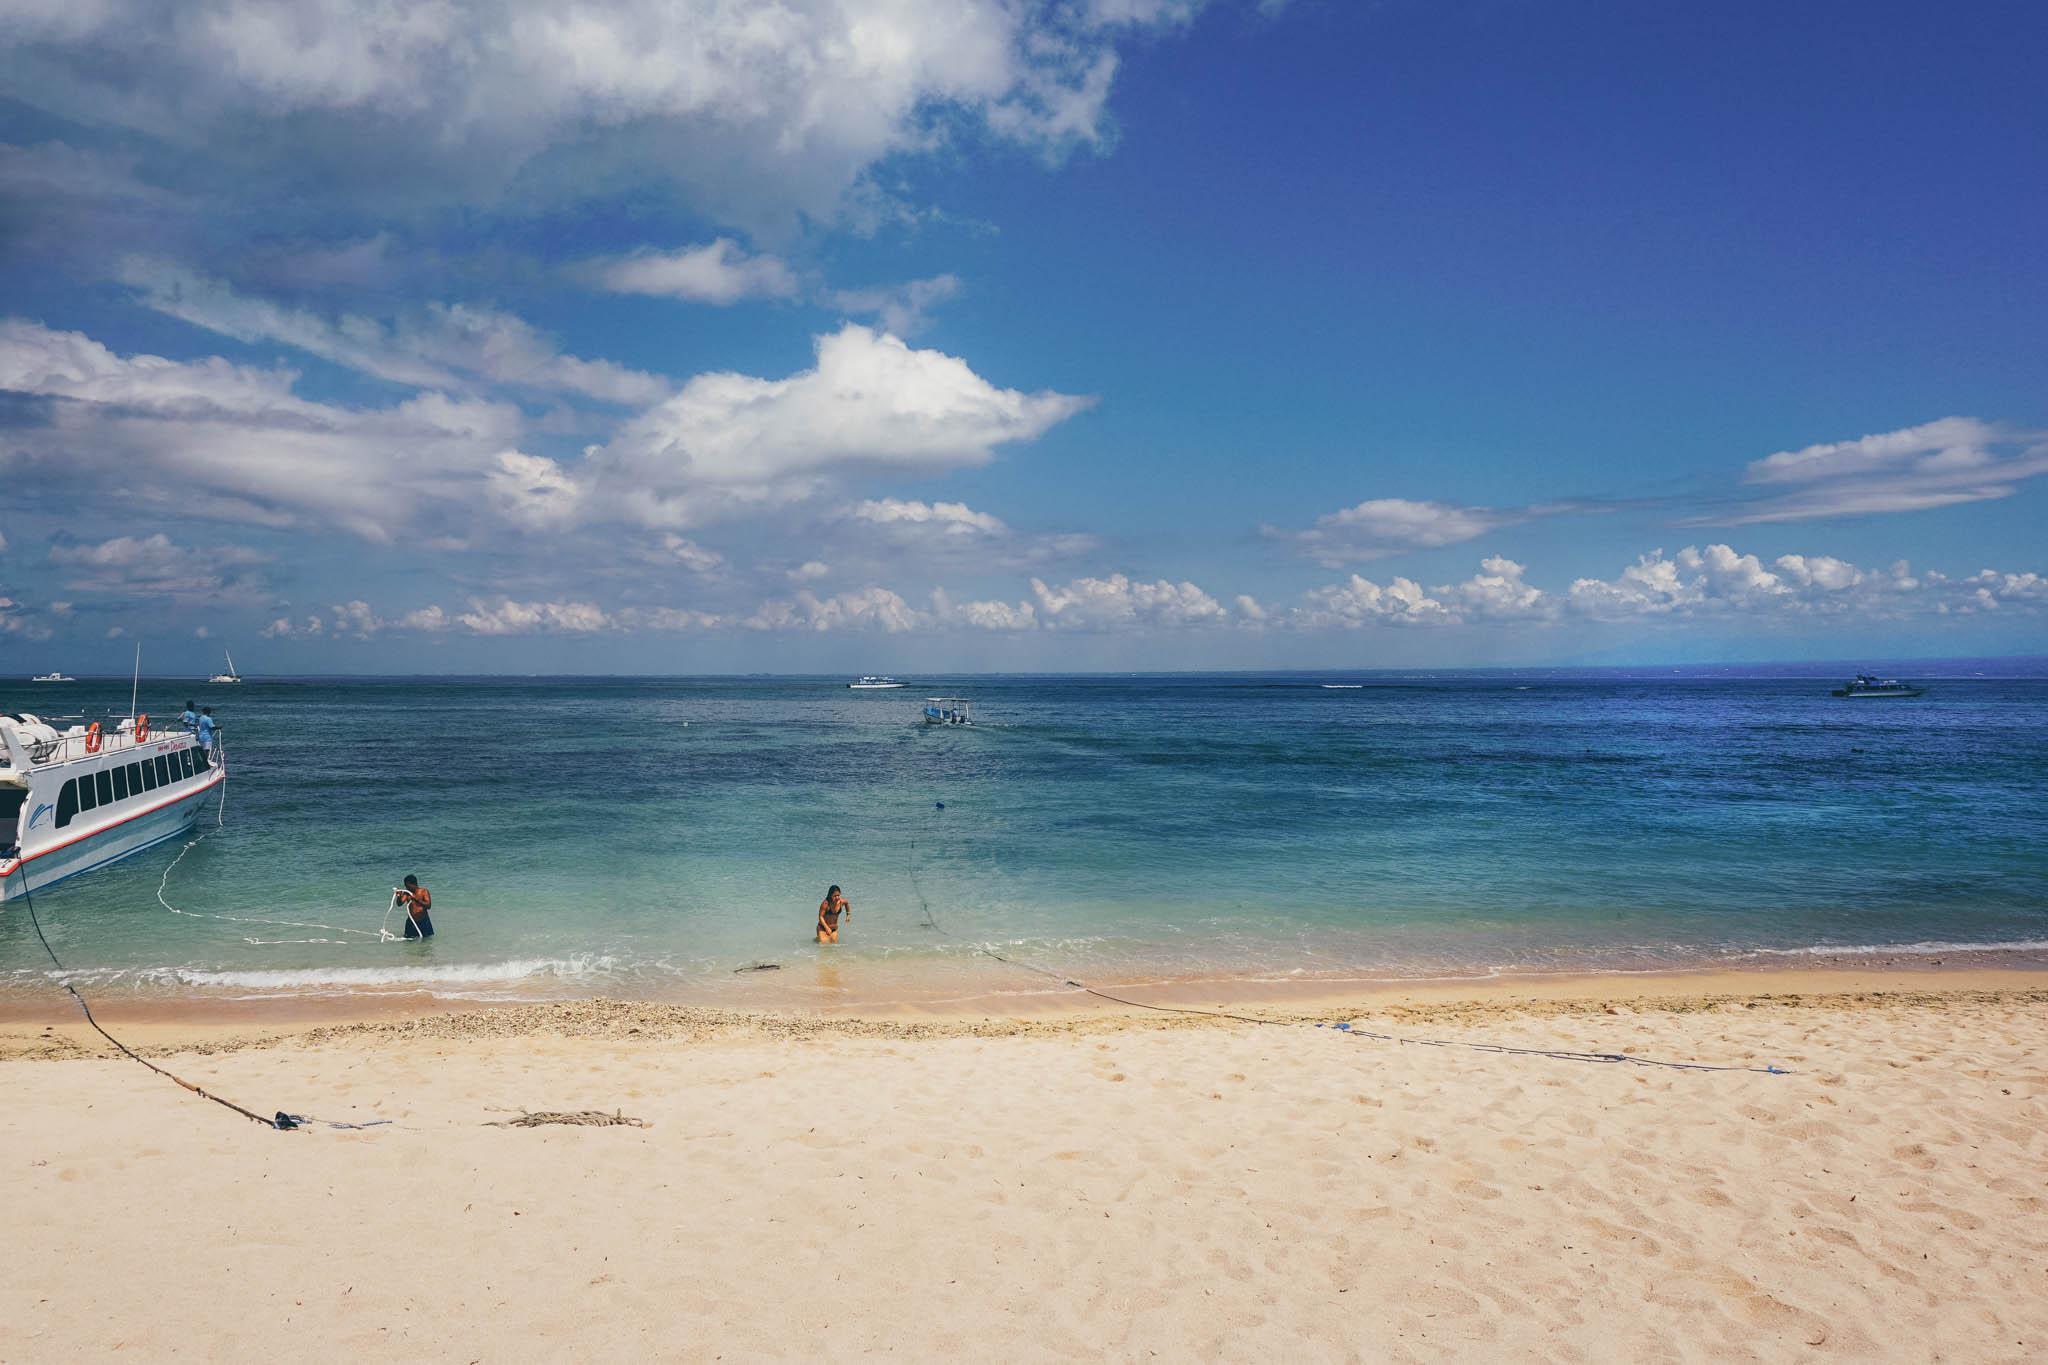 Our view at Lembongan Island